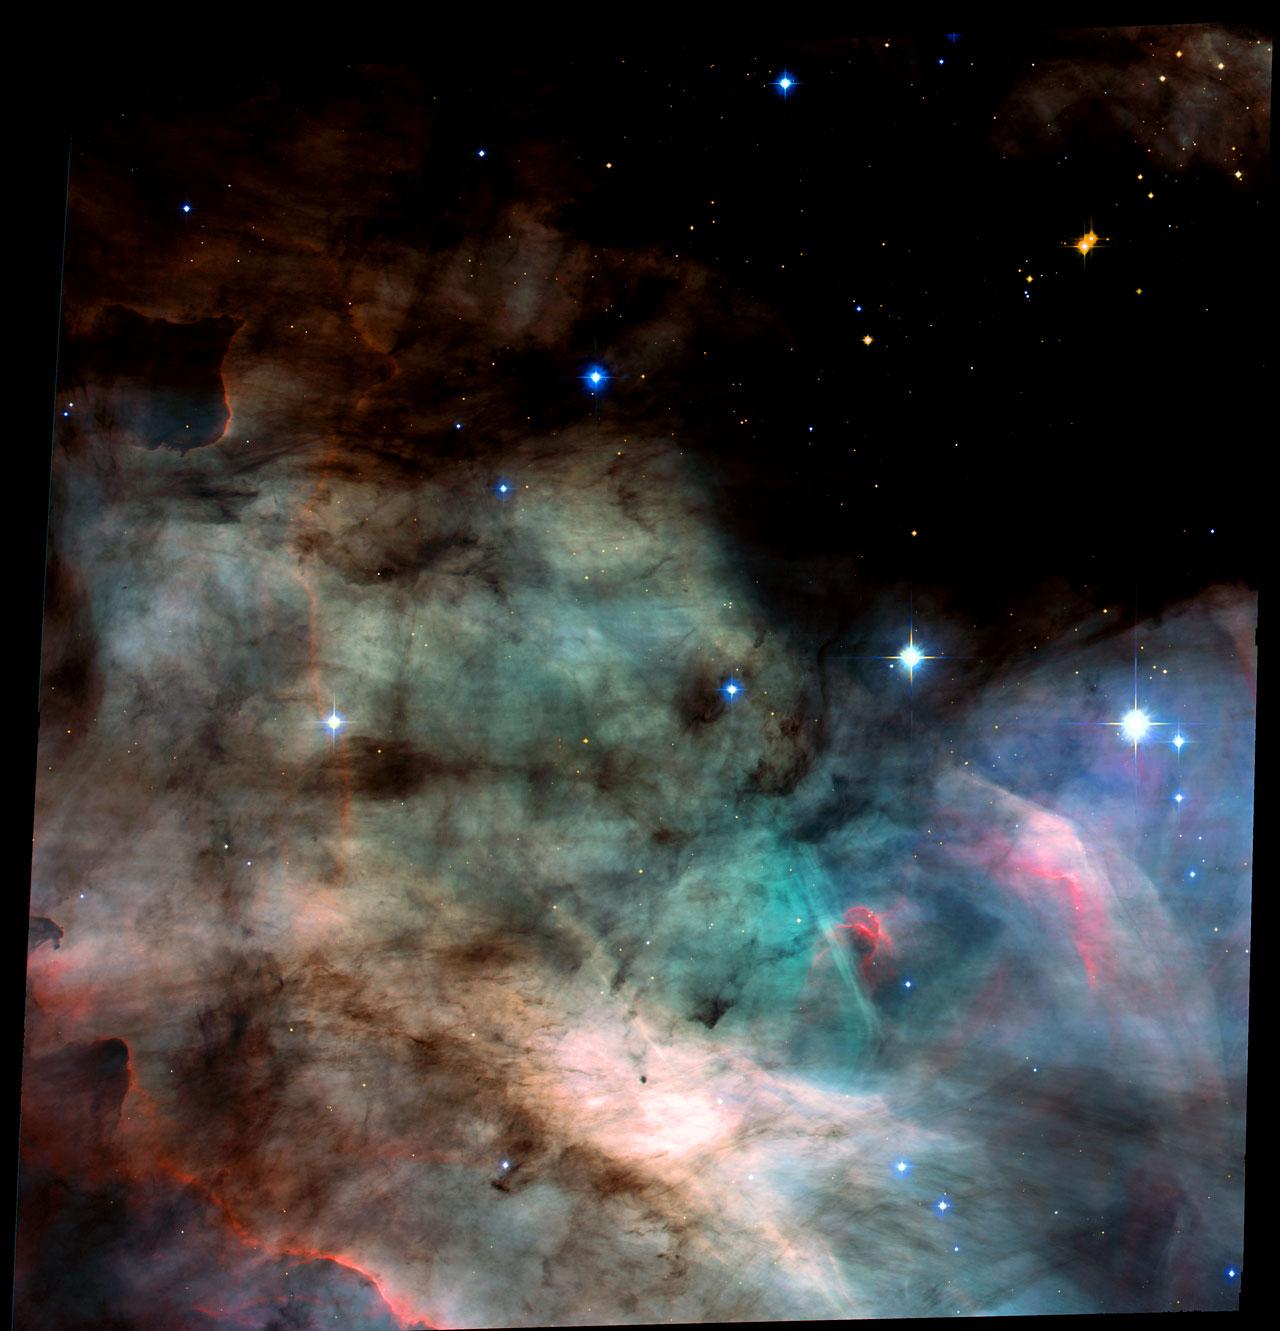 Omega Nebula Swan Nebula M17 Acs Full Field Image Esa